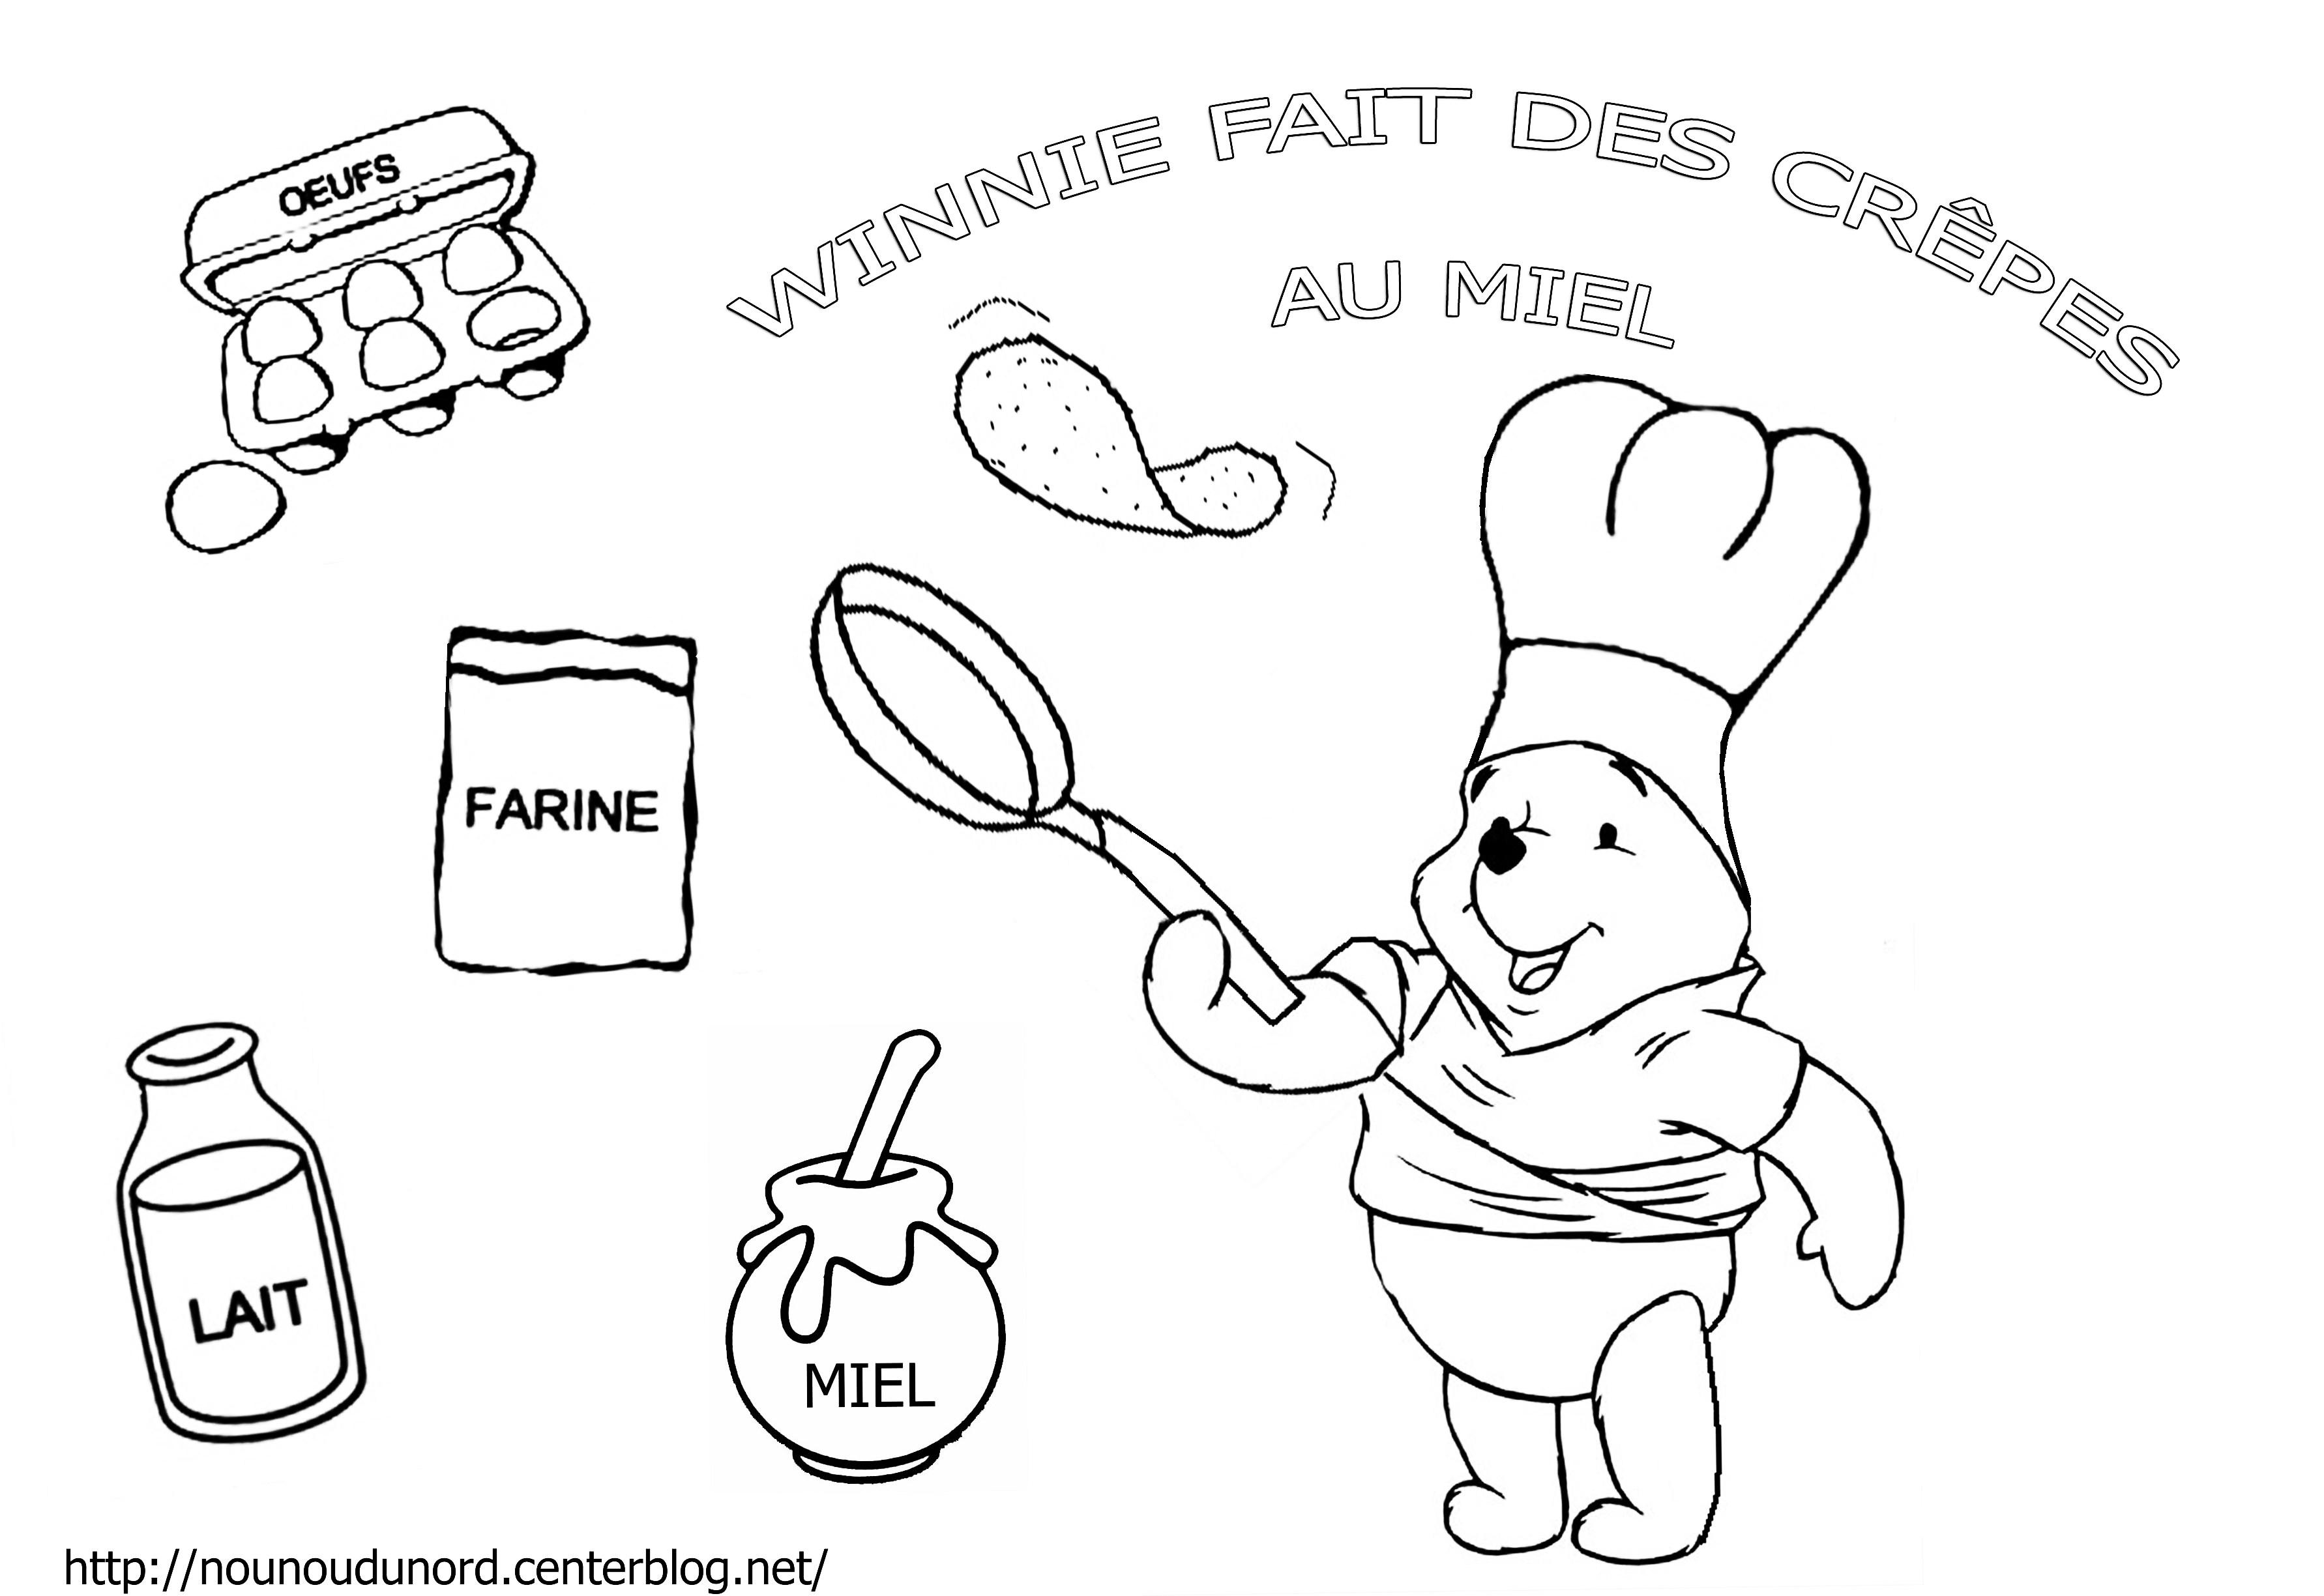 103 dibujos de Winnie the pooh para colorear | Oh Kids | Page 2